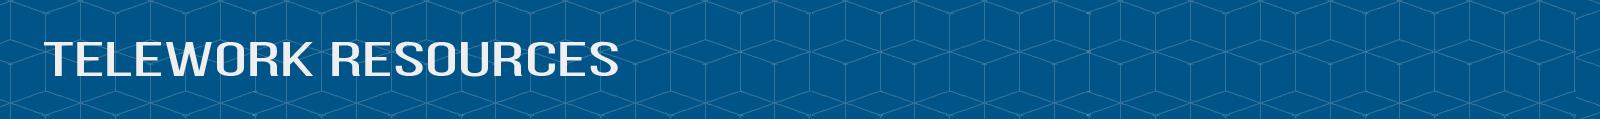 "Header image that reads ""Telework Resources"""